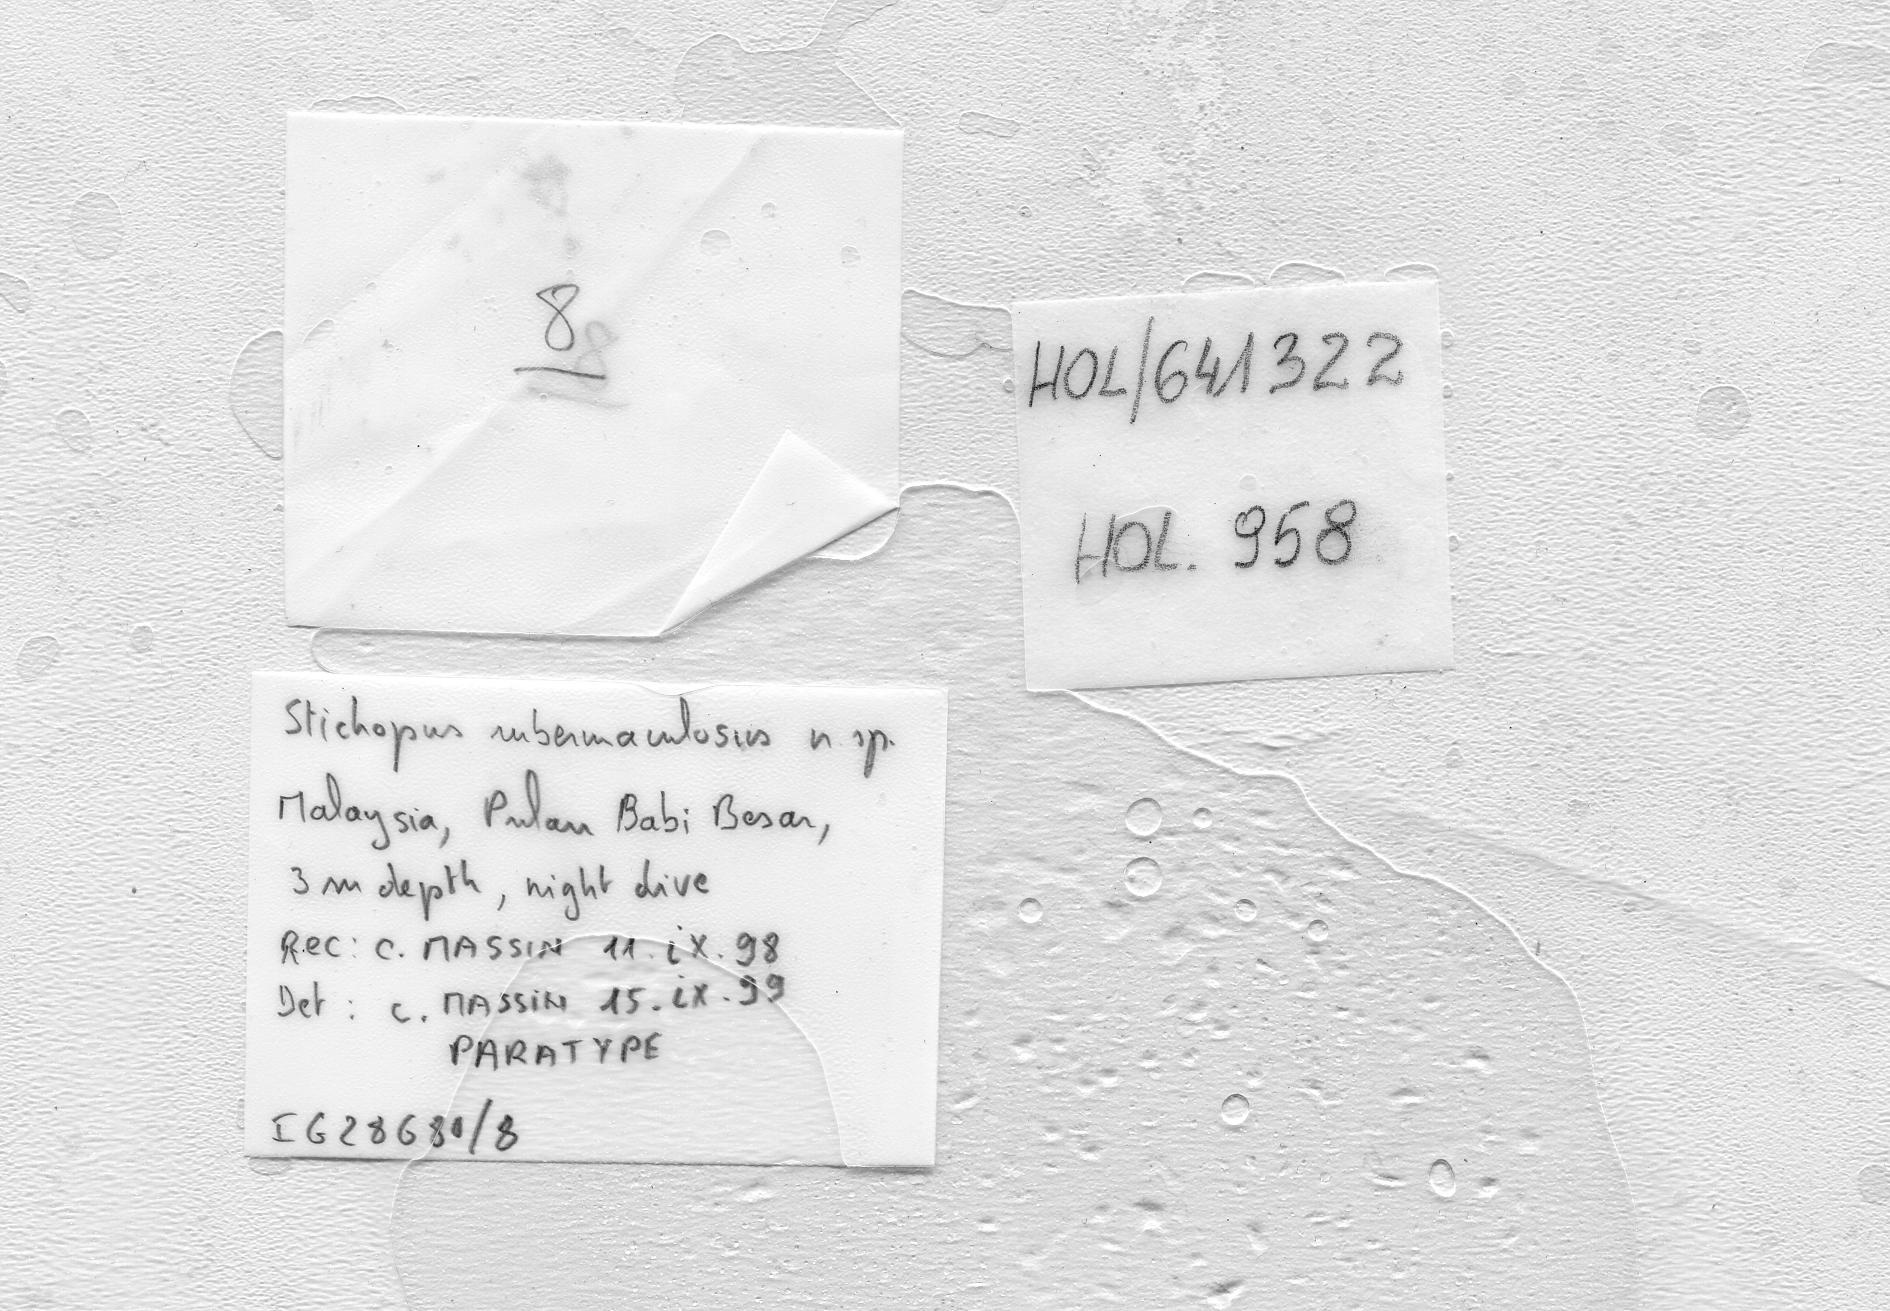 BE-RBINS-INV PARATYPE HOL.958 Stichopus rubermaculosus LABELS.jpg